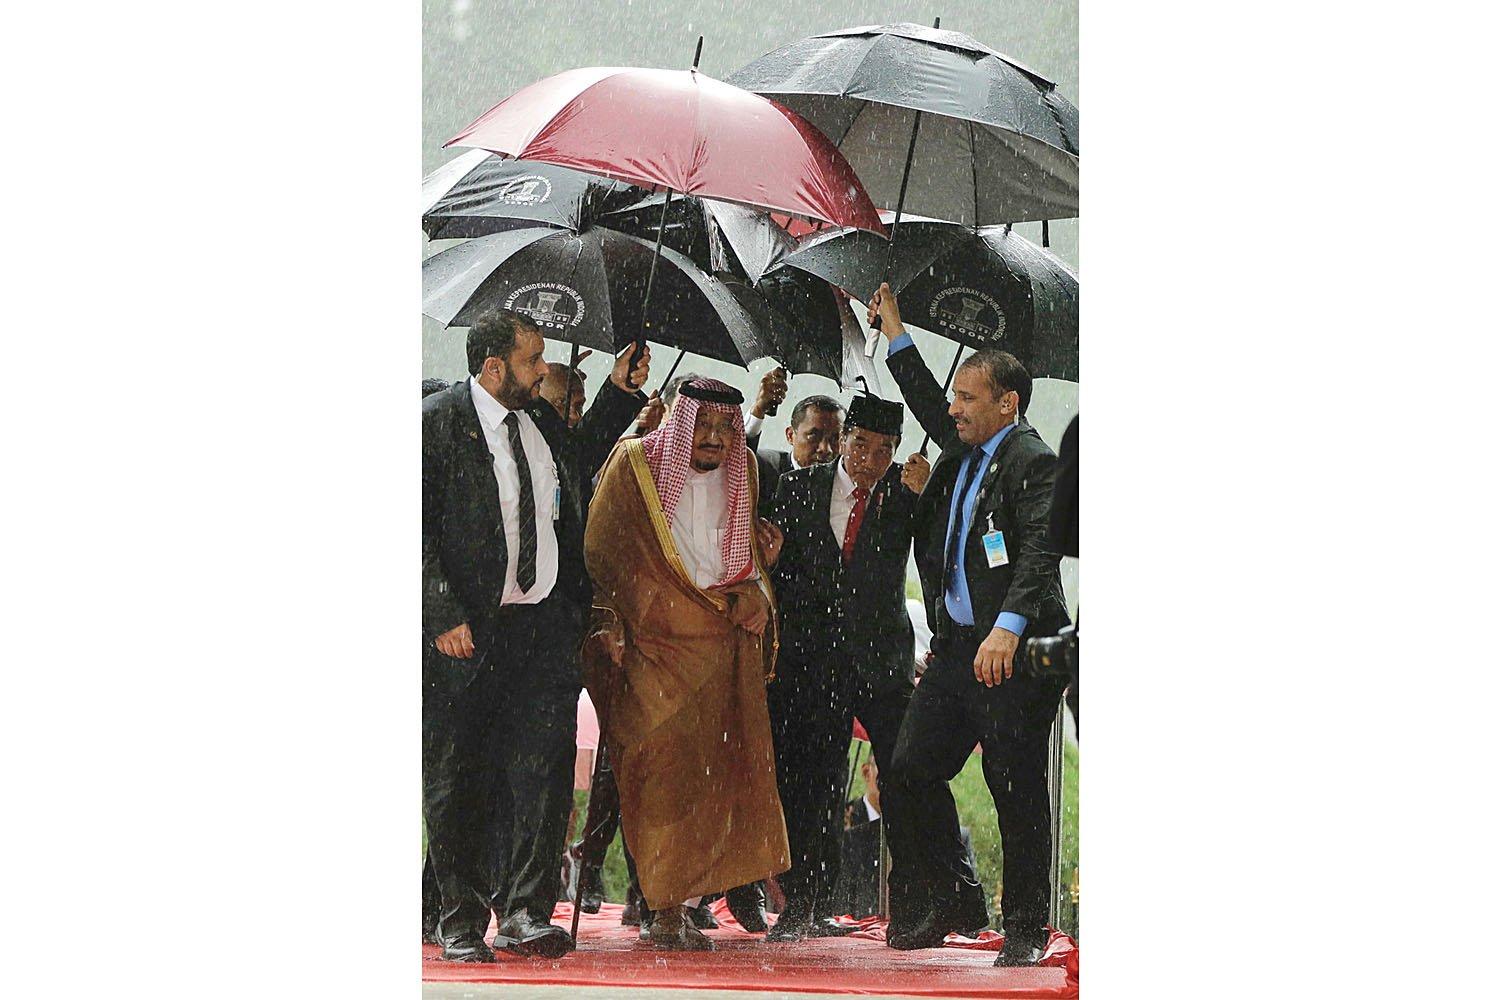 Presiden Joko Widodo (kedua kanan) dan Raja Arab Saudi Salman bin Abdulaziz Al-Saud (kedua kiri) berjalan di bawah payung saat turun hujan lebat di Istana Kepresidenan, Bogor, Jawa Barat, Rabu (1/3).